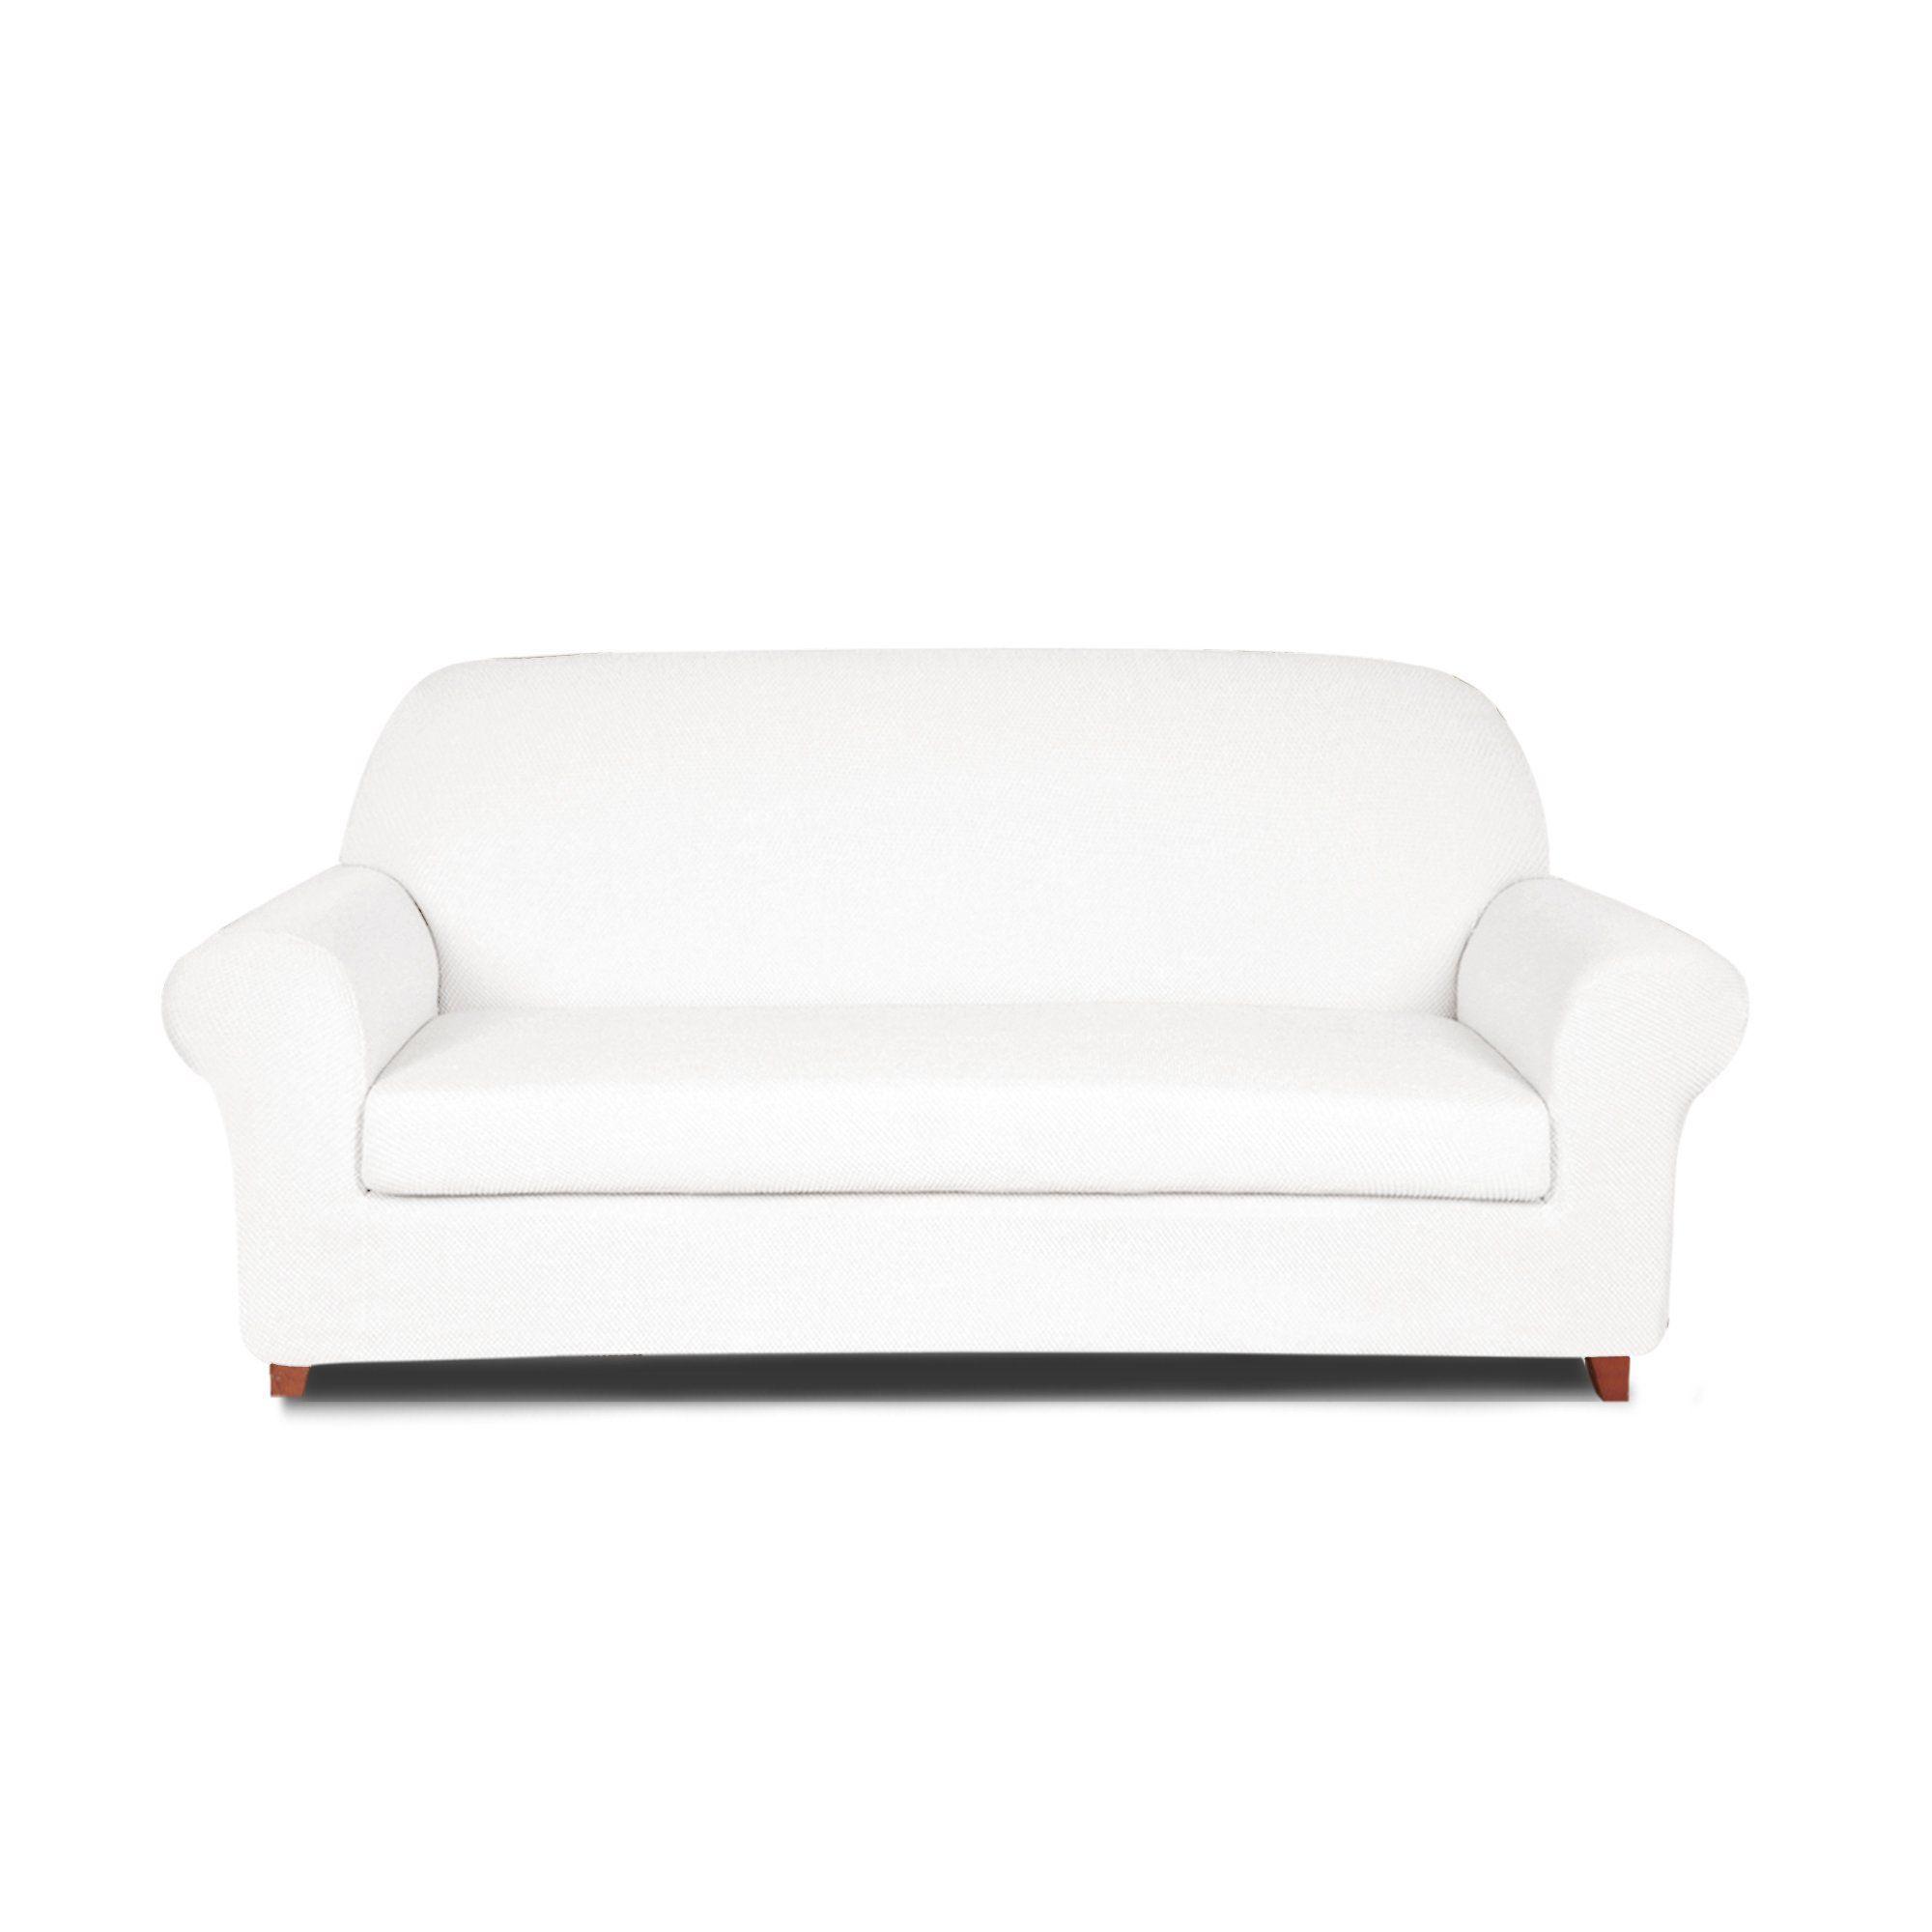 Dyfun 2piece Jacquard Spandex Stretch Living Room Sofa Slipcovers Loveseat White You Can Get More Details By Loveseat Slipcovers Love Seat Slipcovered Sofa